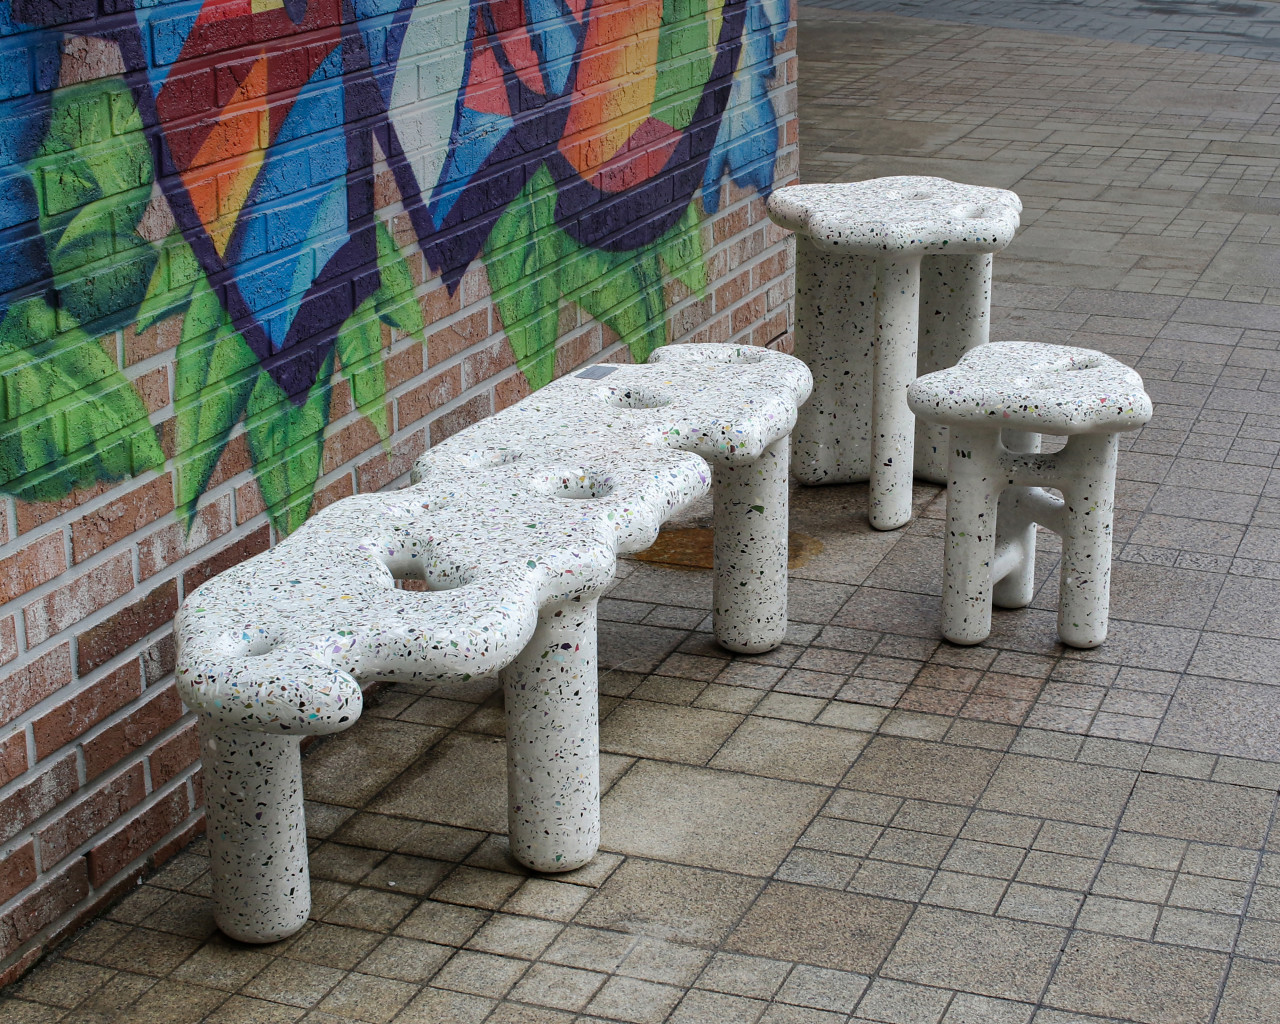 Studio HAK's Terrazzo-Like Debris Series Is Made From Plastic and Concrete